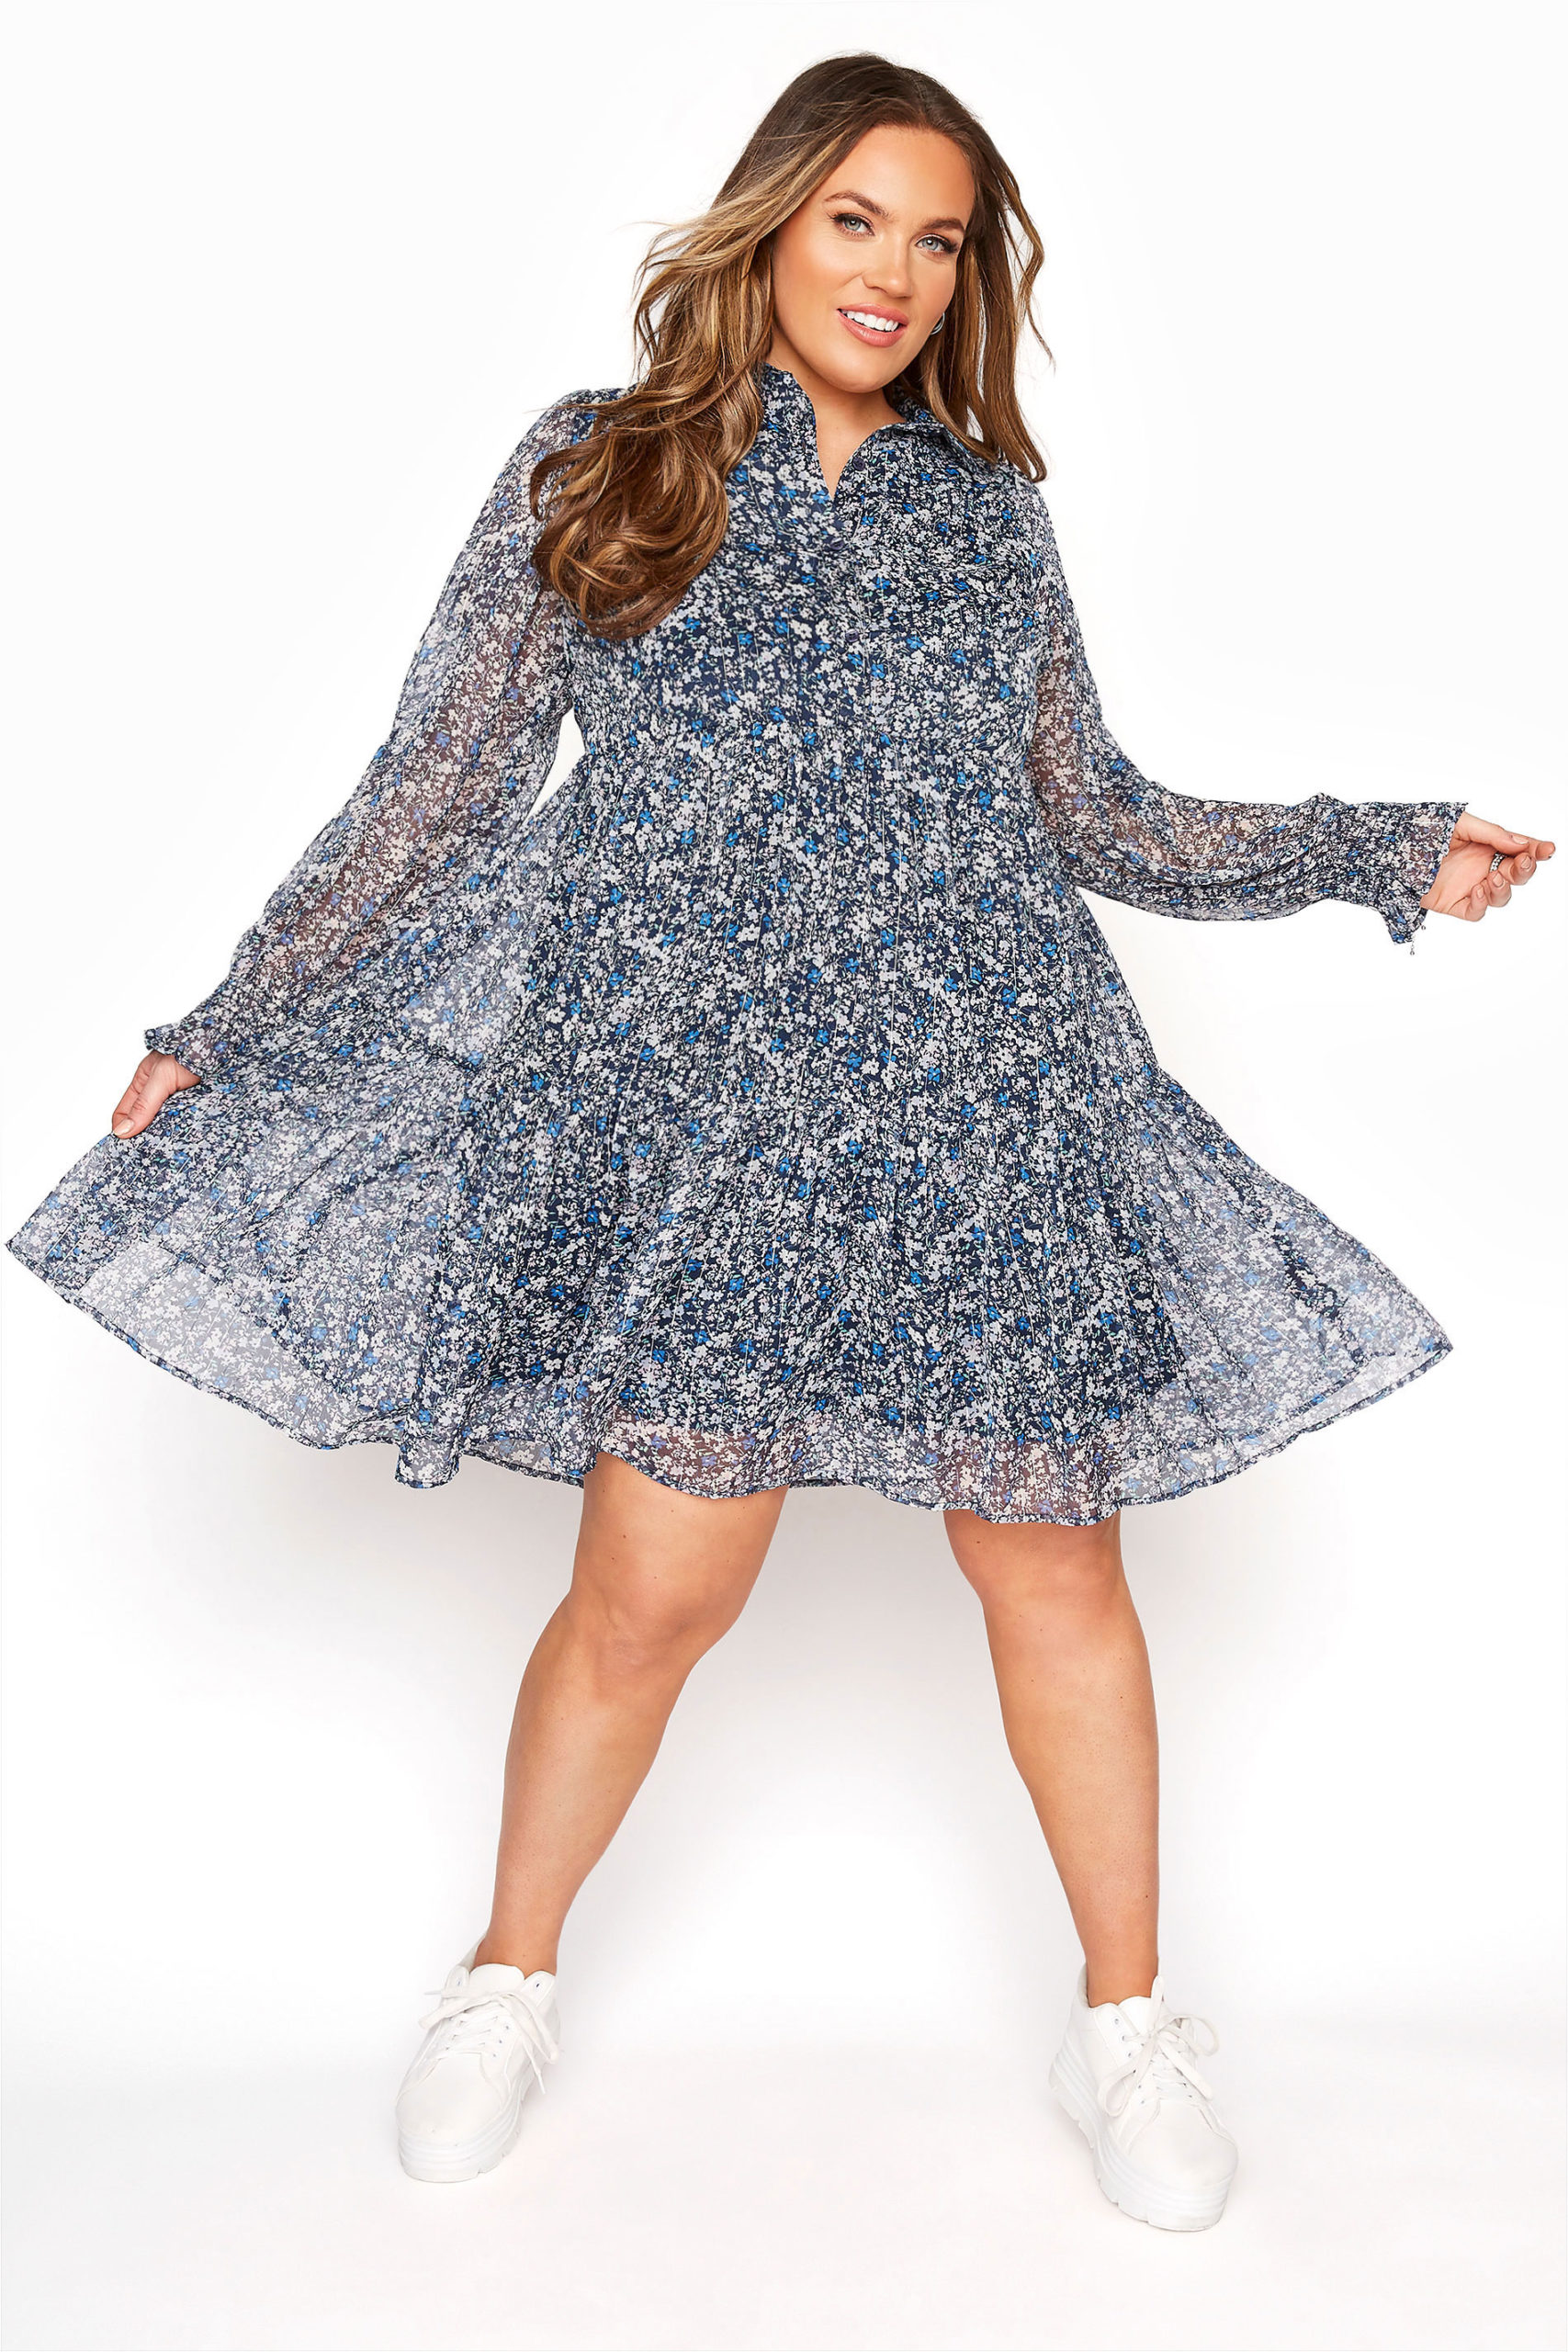 Plus Size Smocked Dress